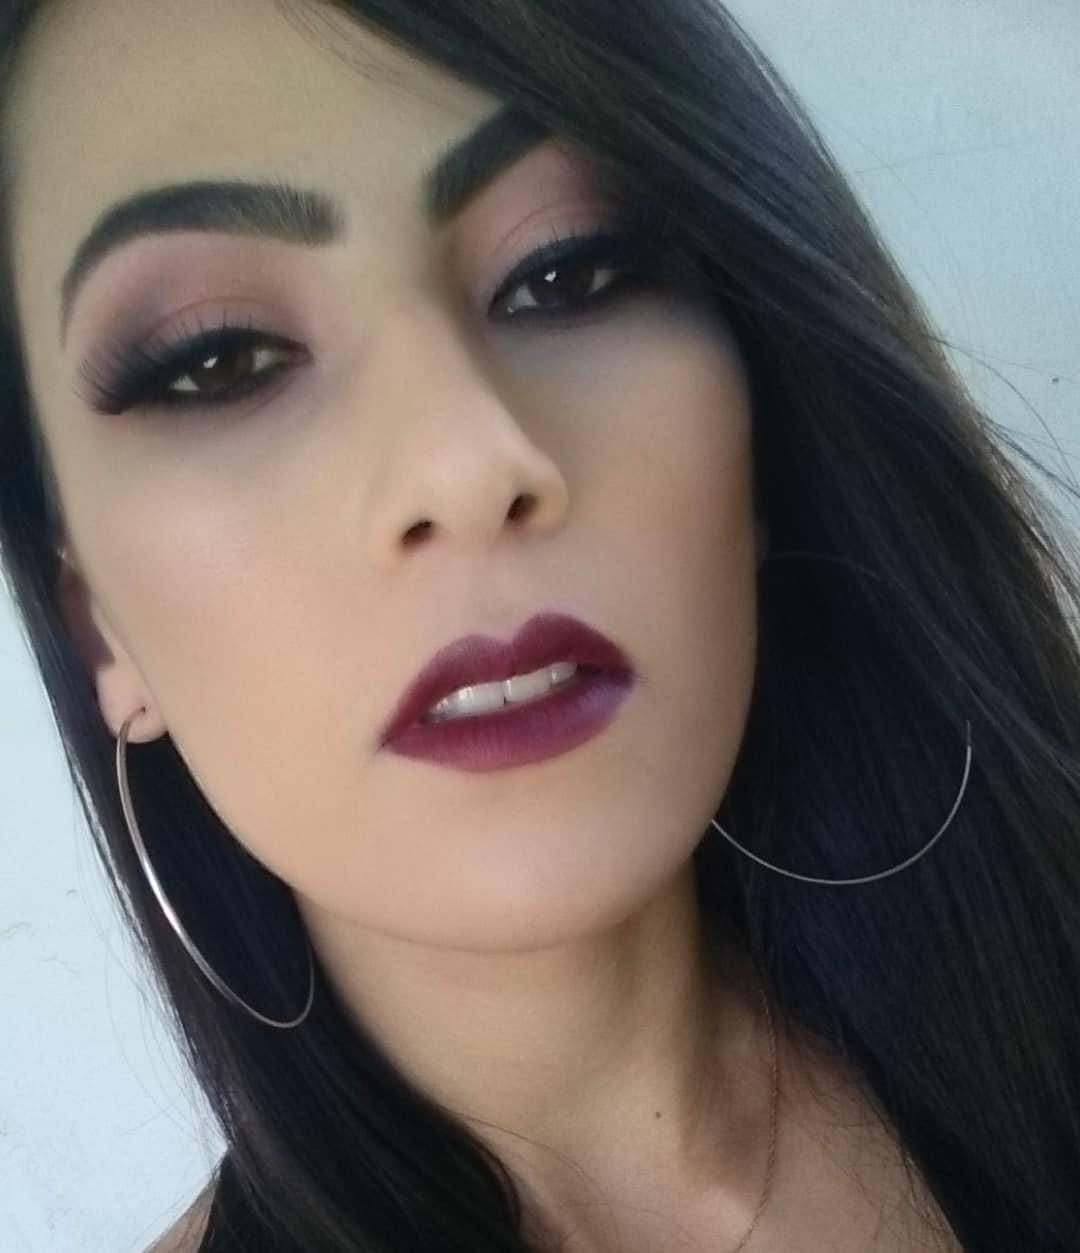 camilla syal, miss goias mundo 2018. 33559613